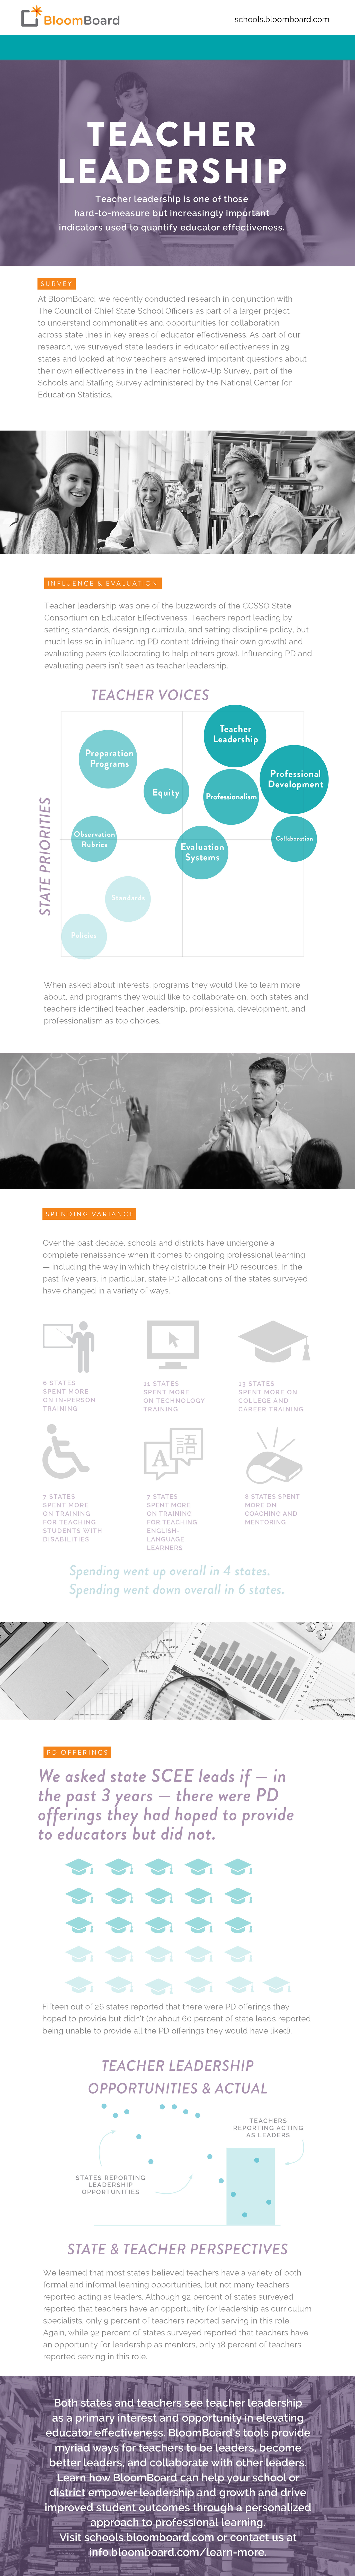 teacher leadership infographic